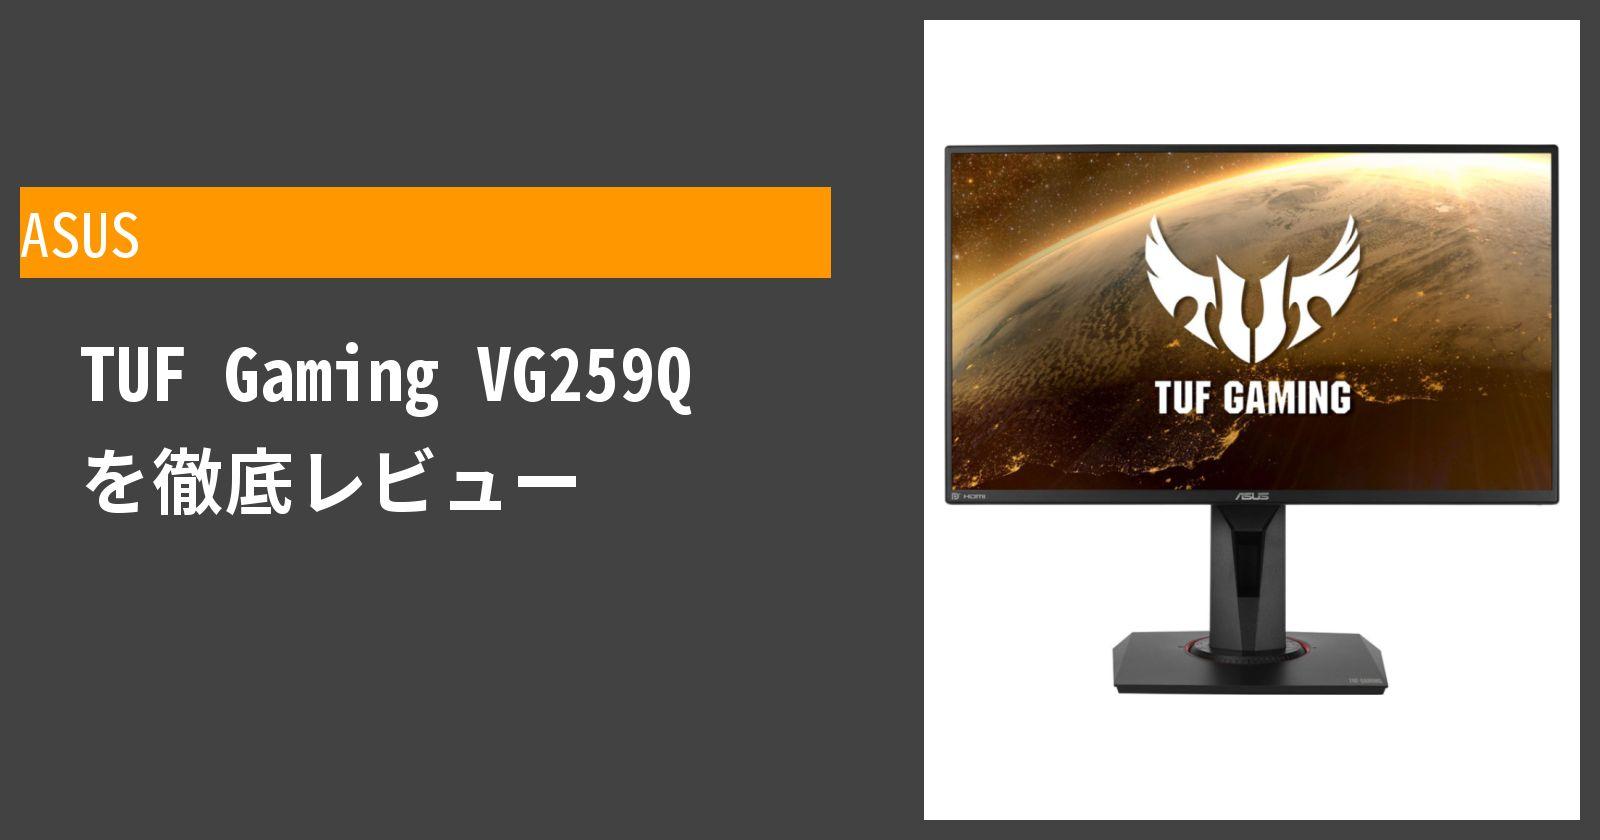 TUF Gaming VG259Qを徹底評価